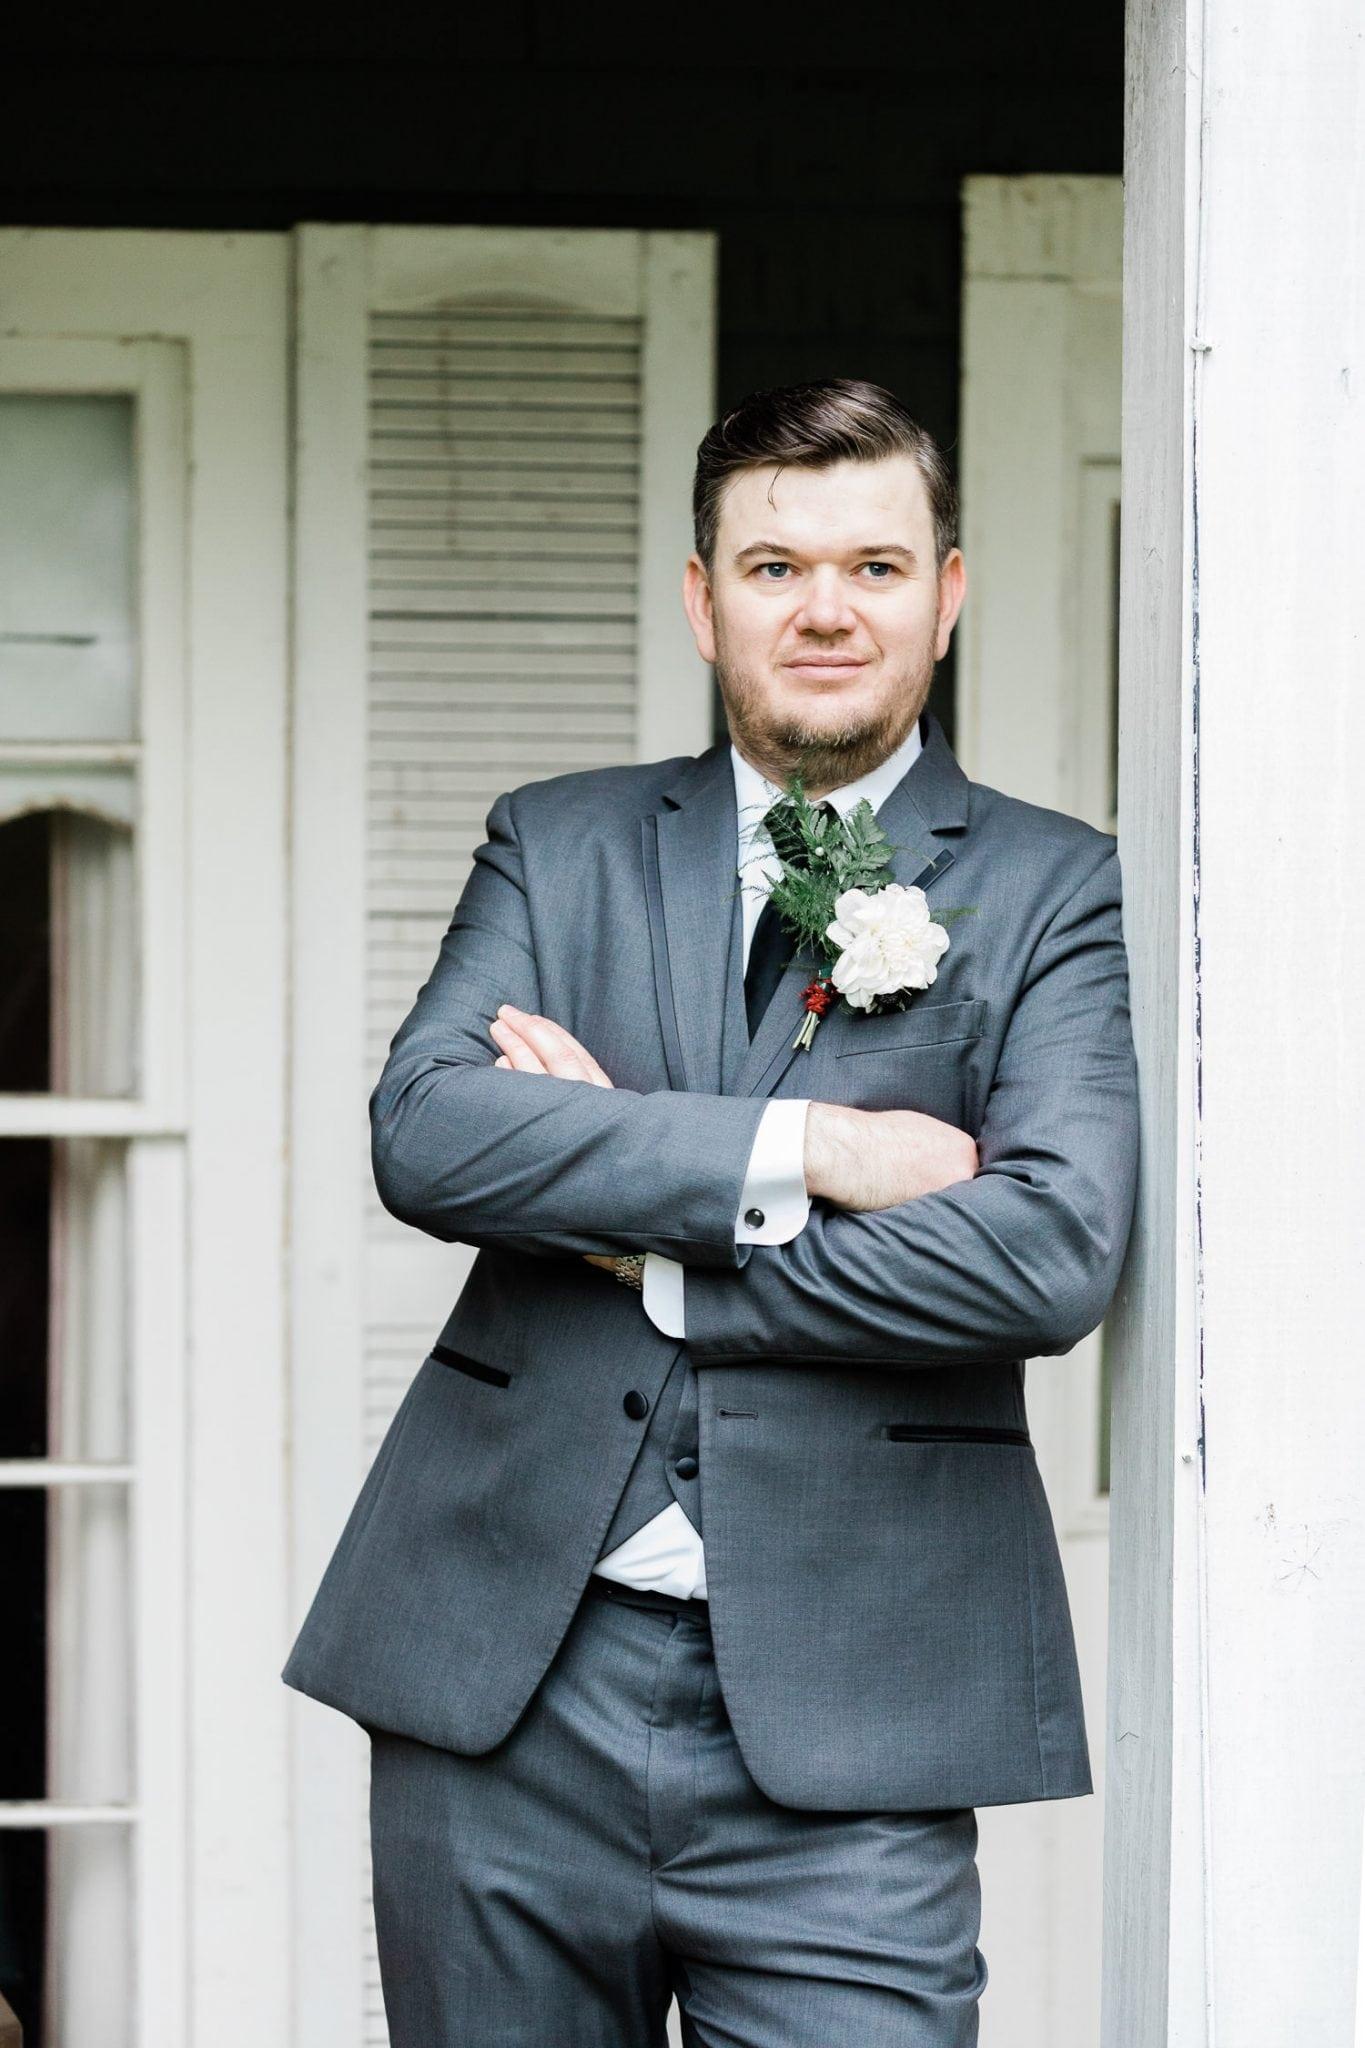 Rustic backyard wedding picture with groom | Vancouver wedding photographer